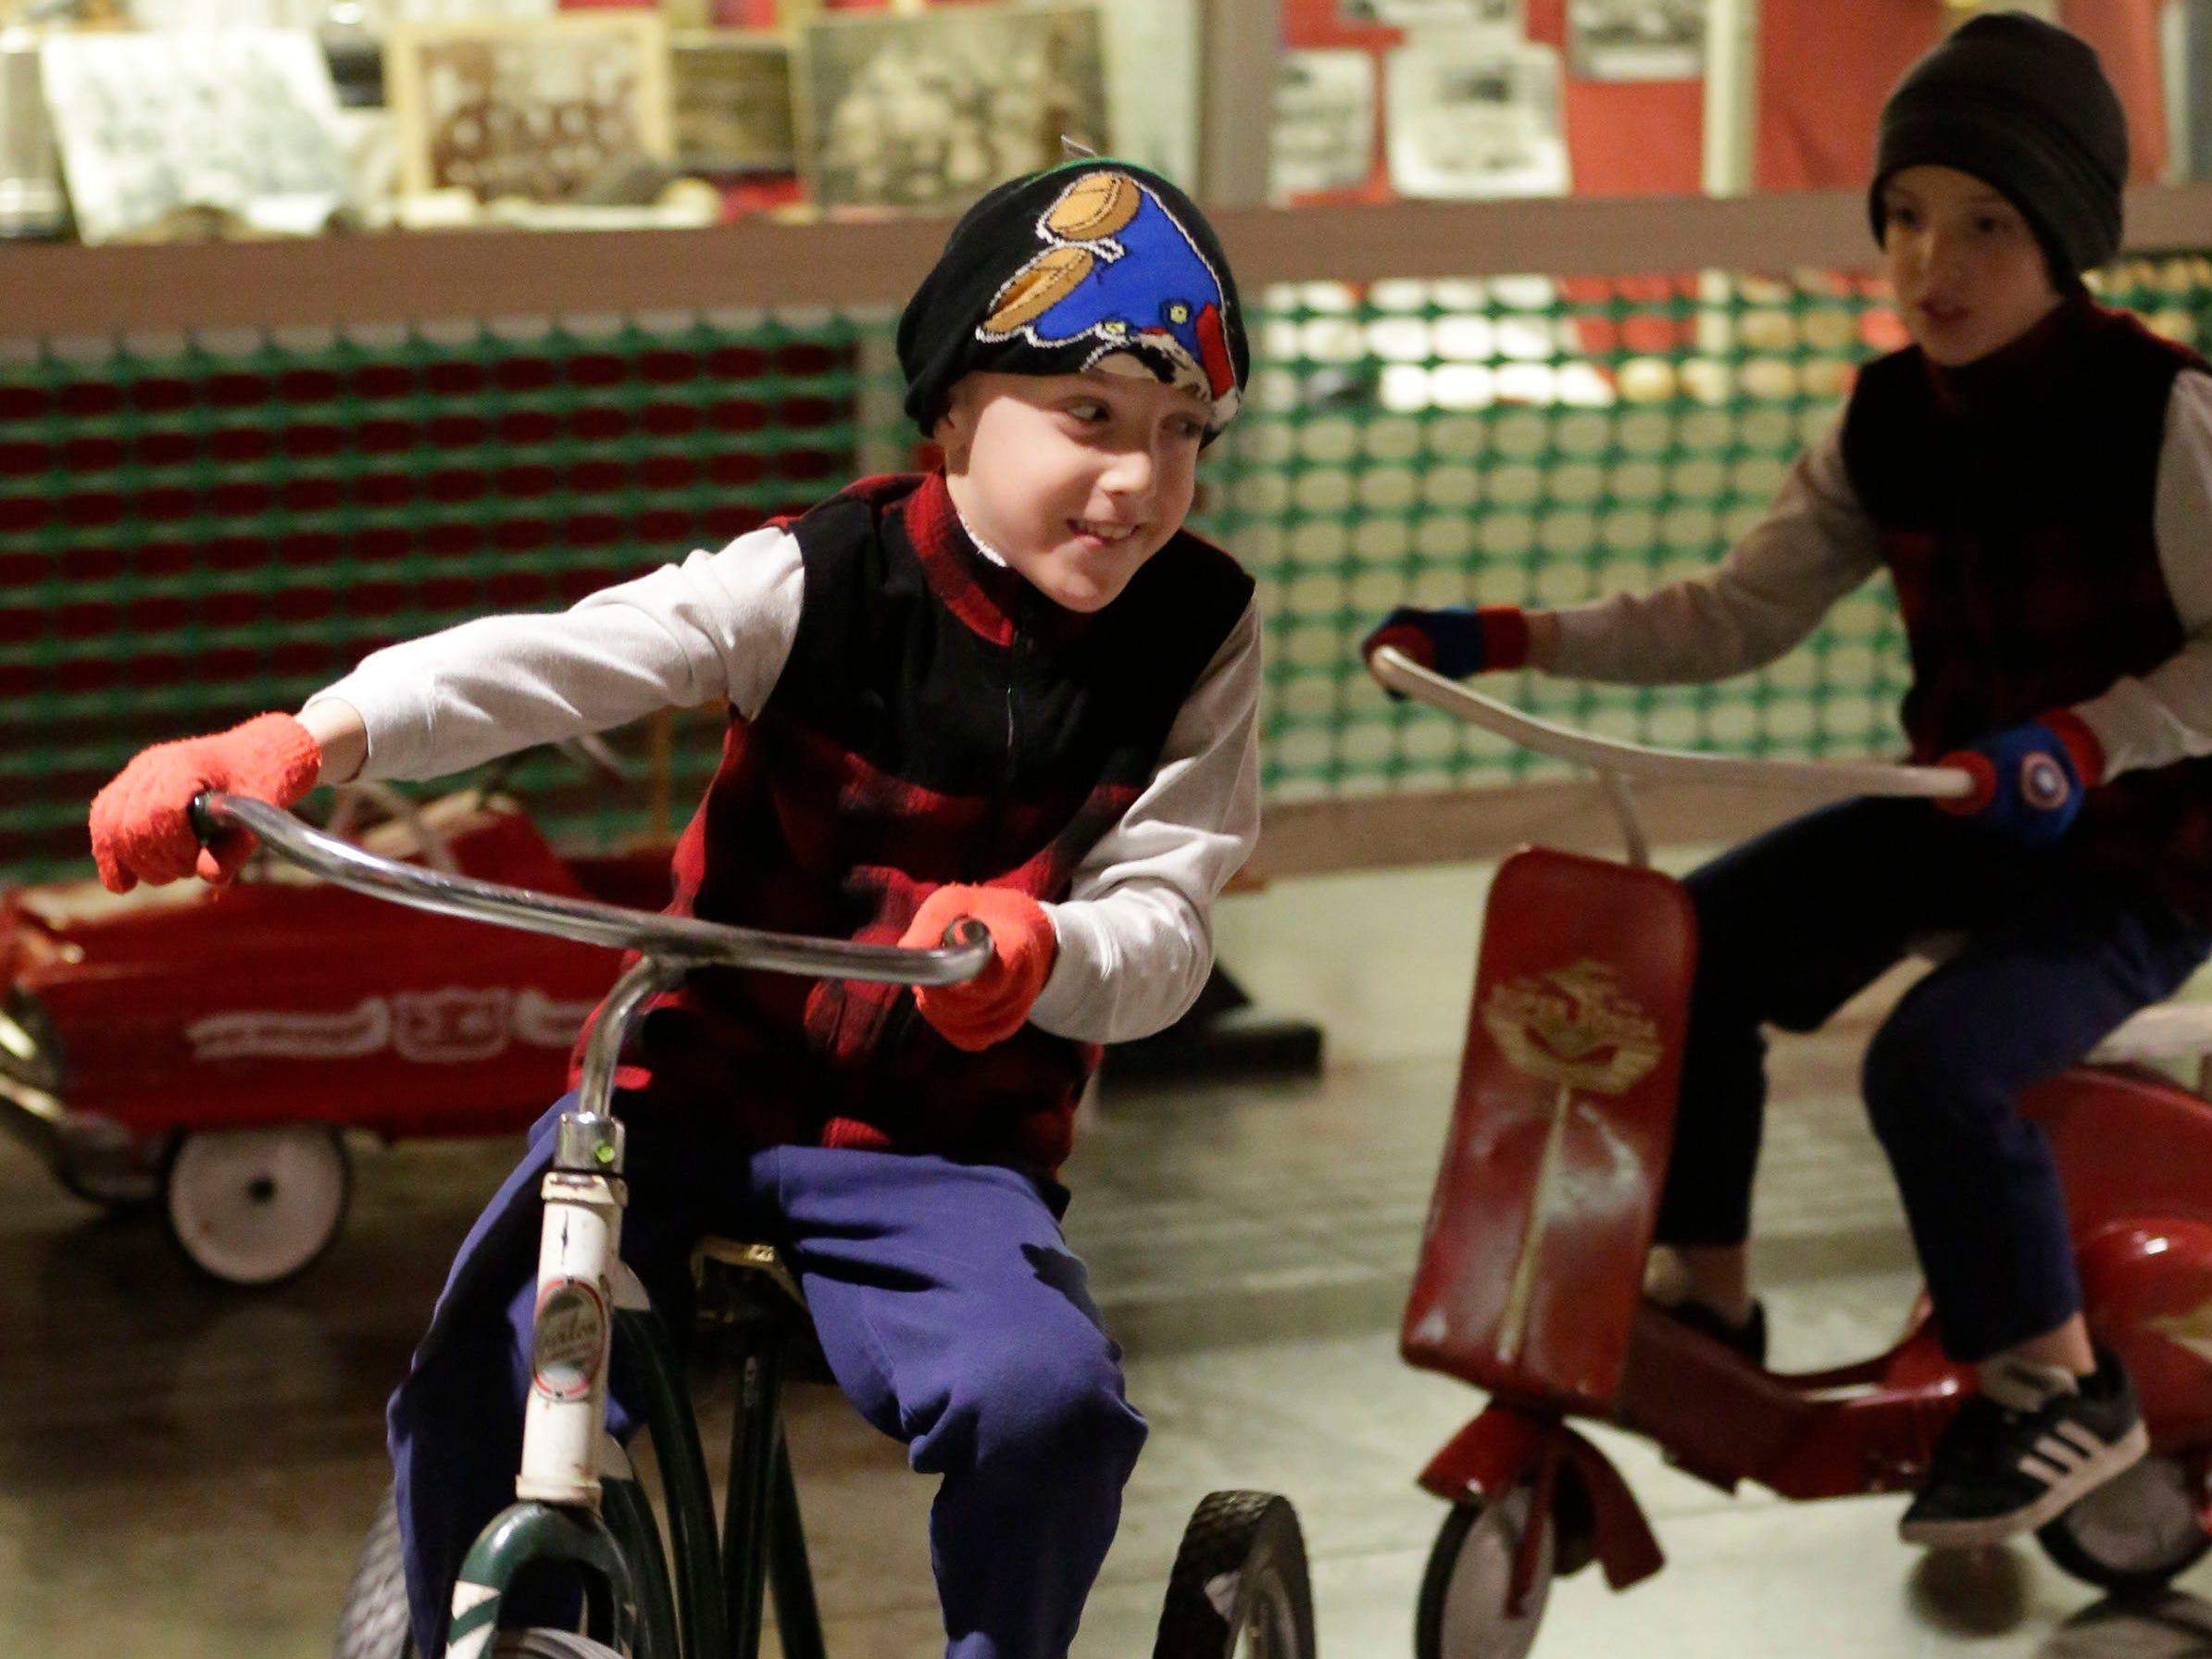 Bryce Van Auken, 7, of Sheboygan Falls, Wis., pedals a vintage Garton toy ahead of his twin brother Nolan, 7, during the Sheboygan County Historical Museum's Holiday Memories, Friday, November 23, 2018, in Sheboygan, Wis.